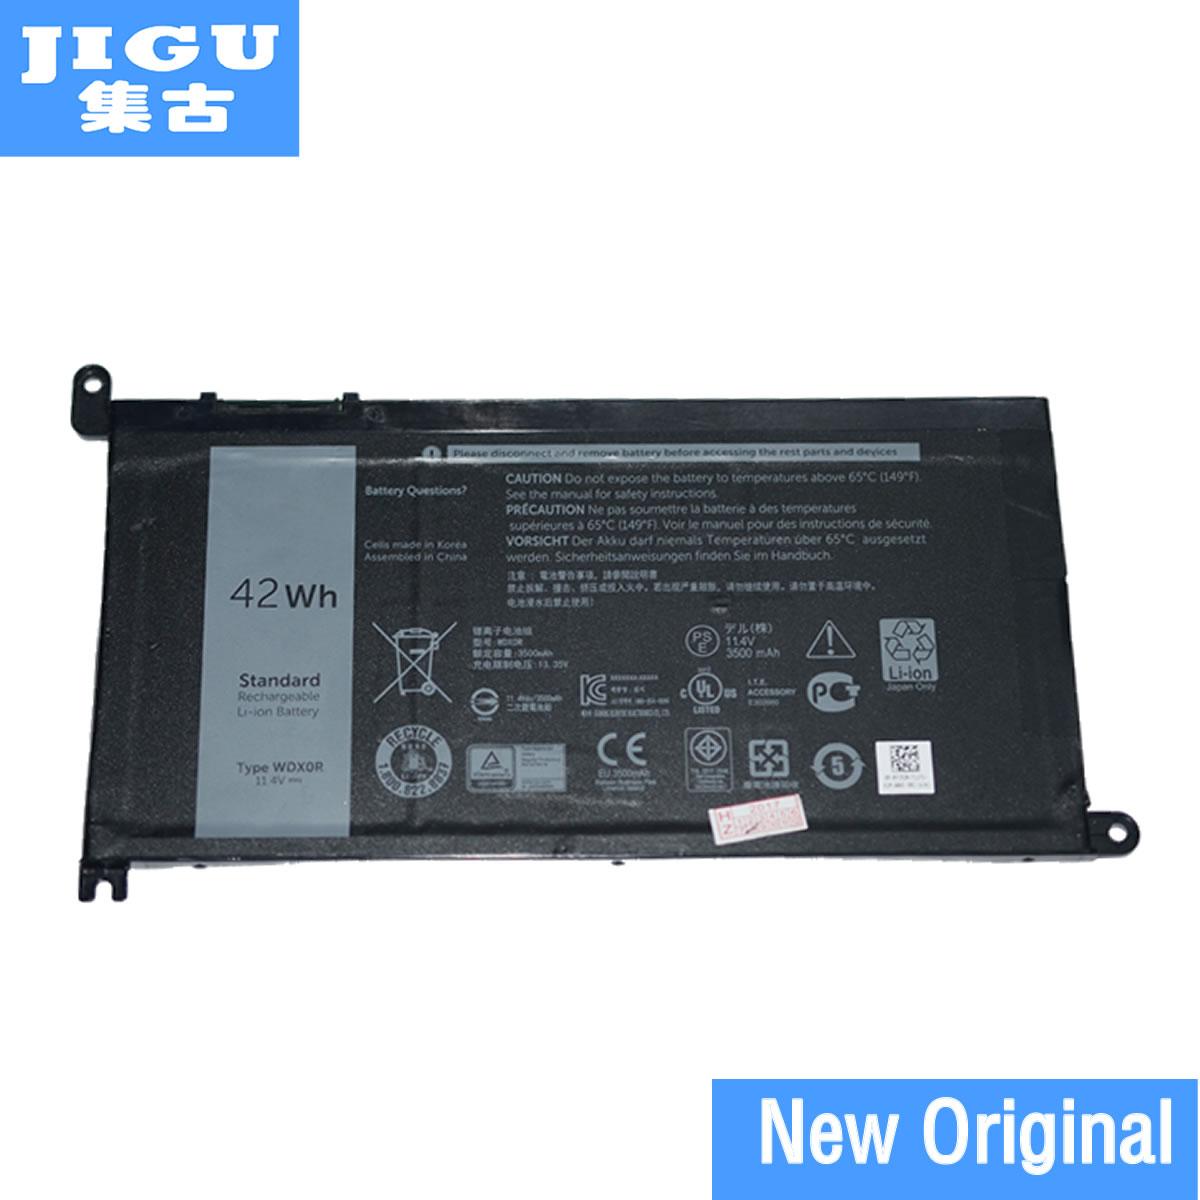 JIGU Original Laptop Battery 3CRH3 WDX0R